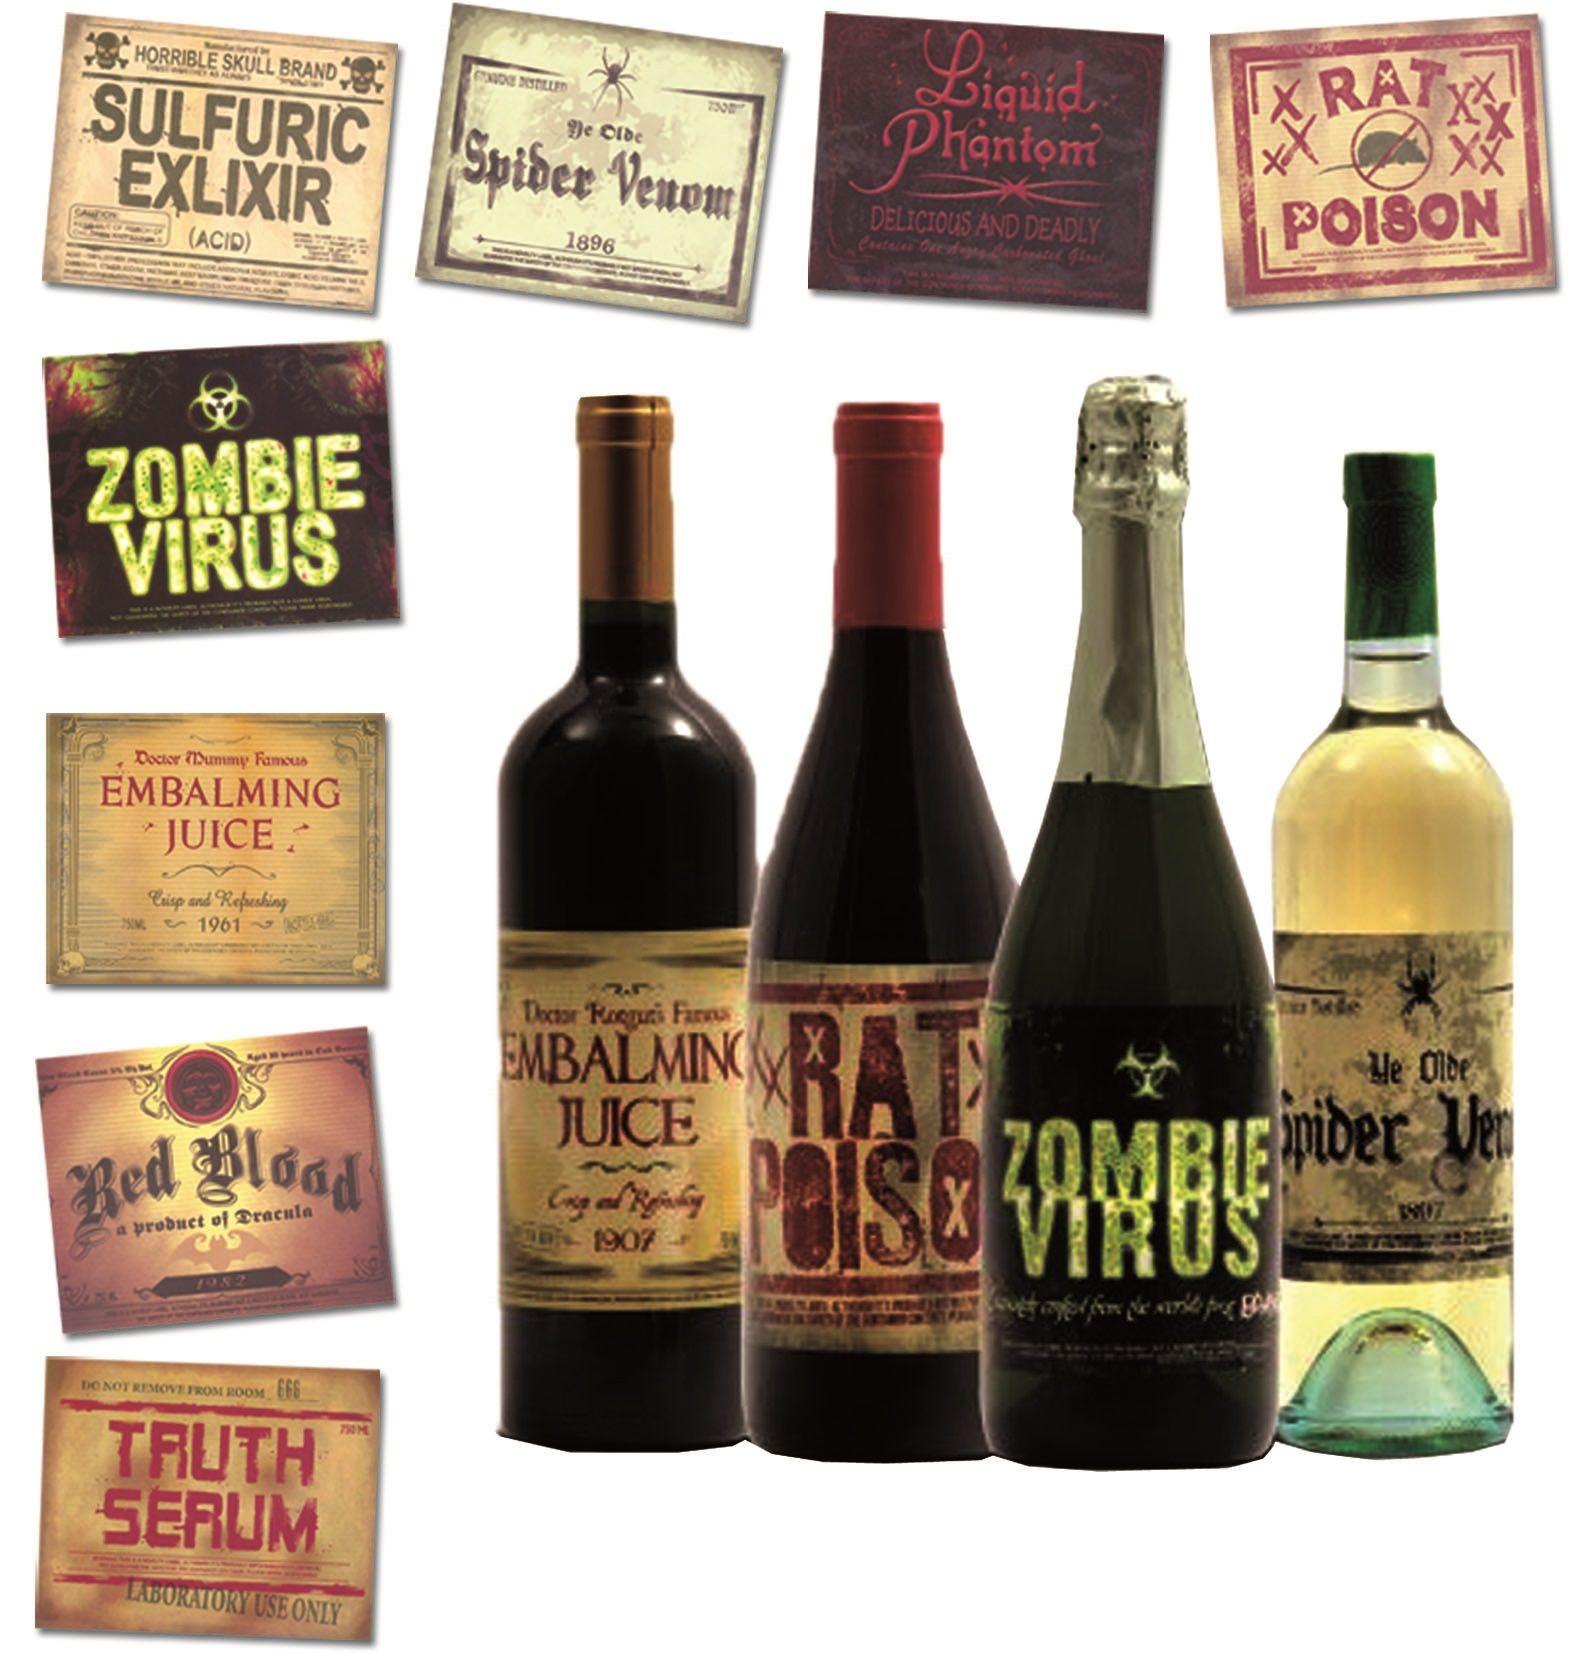 Halloween Flaschen-Etiketten   Handmade   Pinterest   Horror party